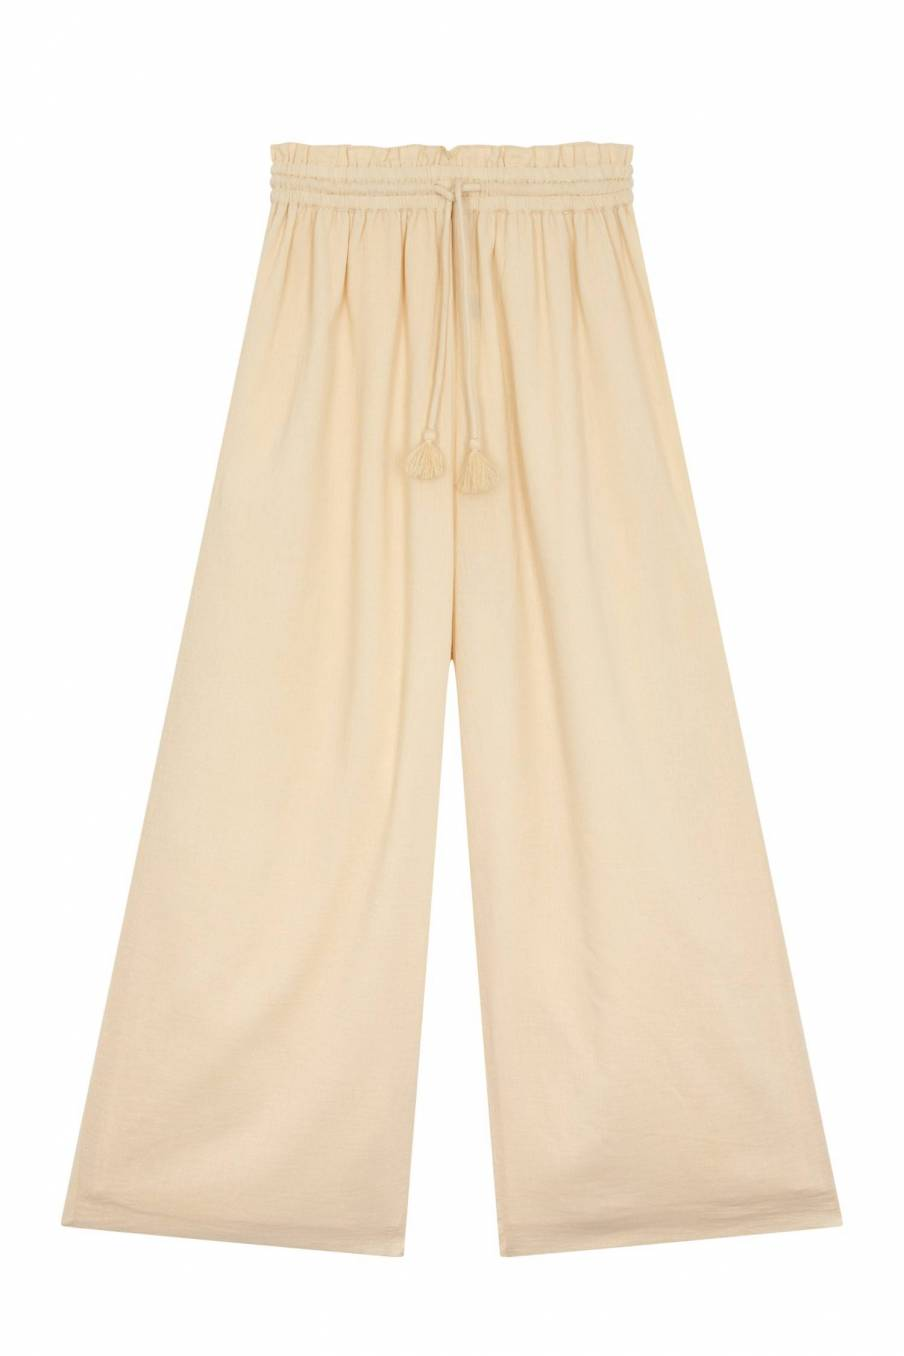 Pants Anchita Cream